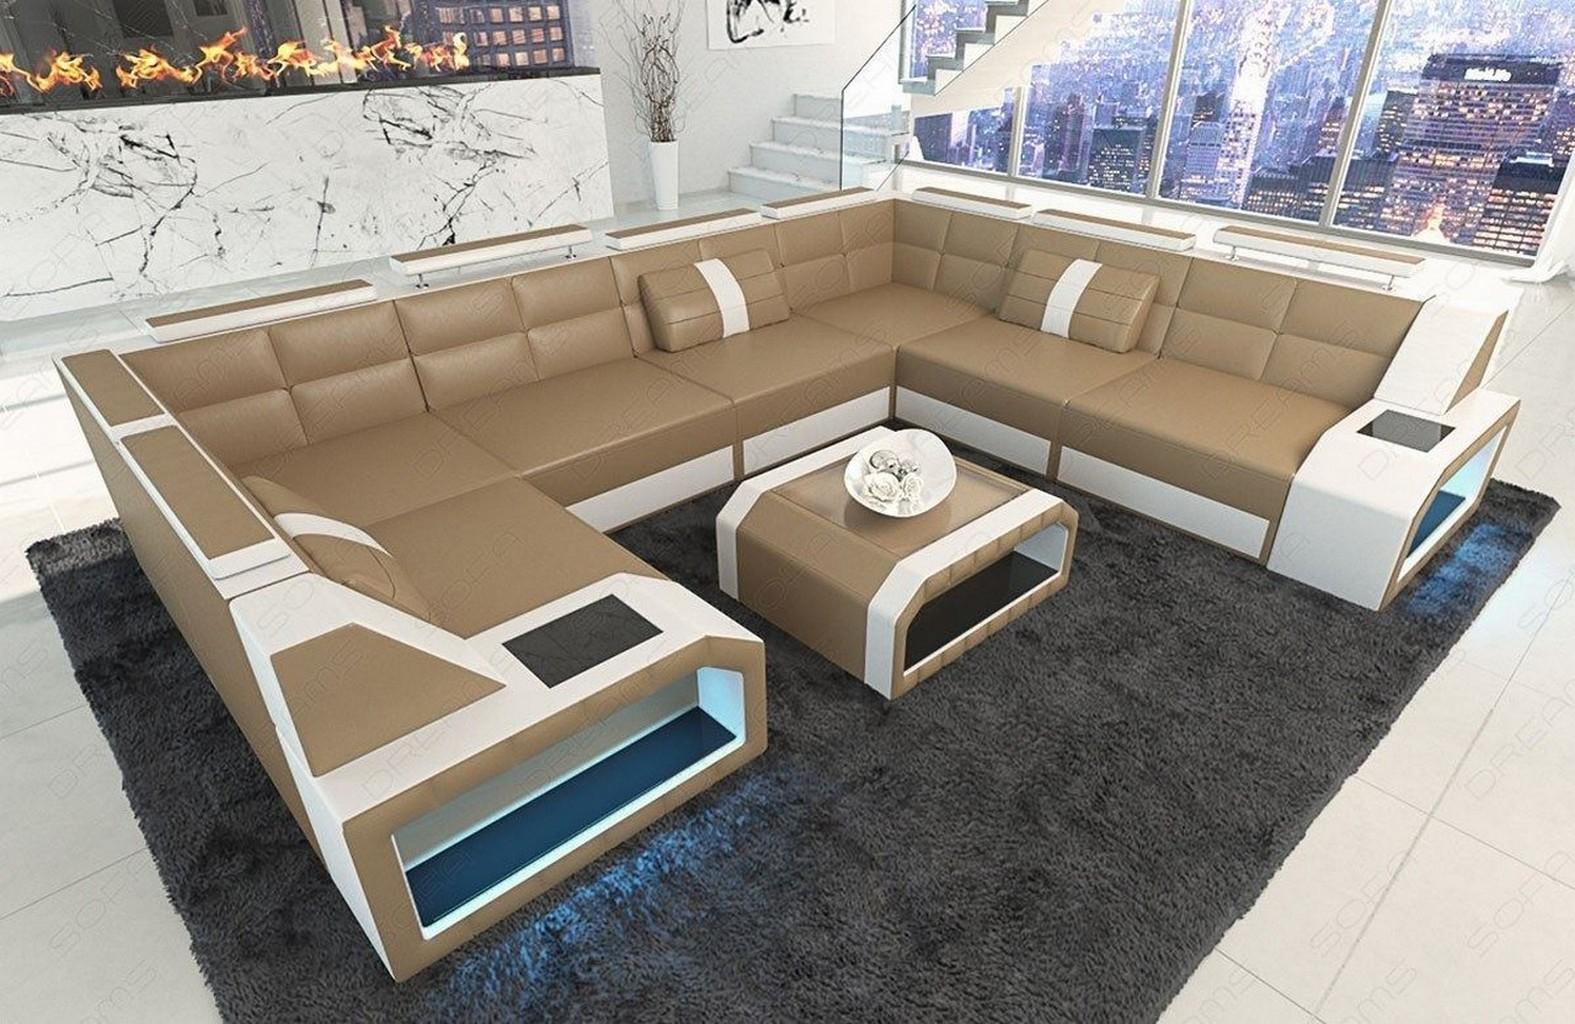 ledercouch ecksofa luxus sofa pesaro u form mit led beleuchtung designer couch 1001. Black Bedroom Furniture Sets. Home Design Ideas